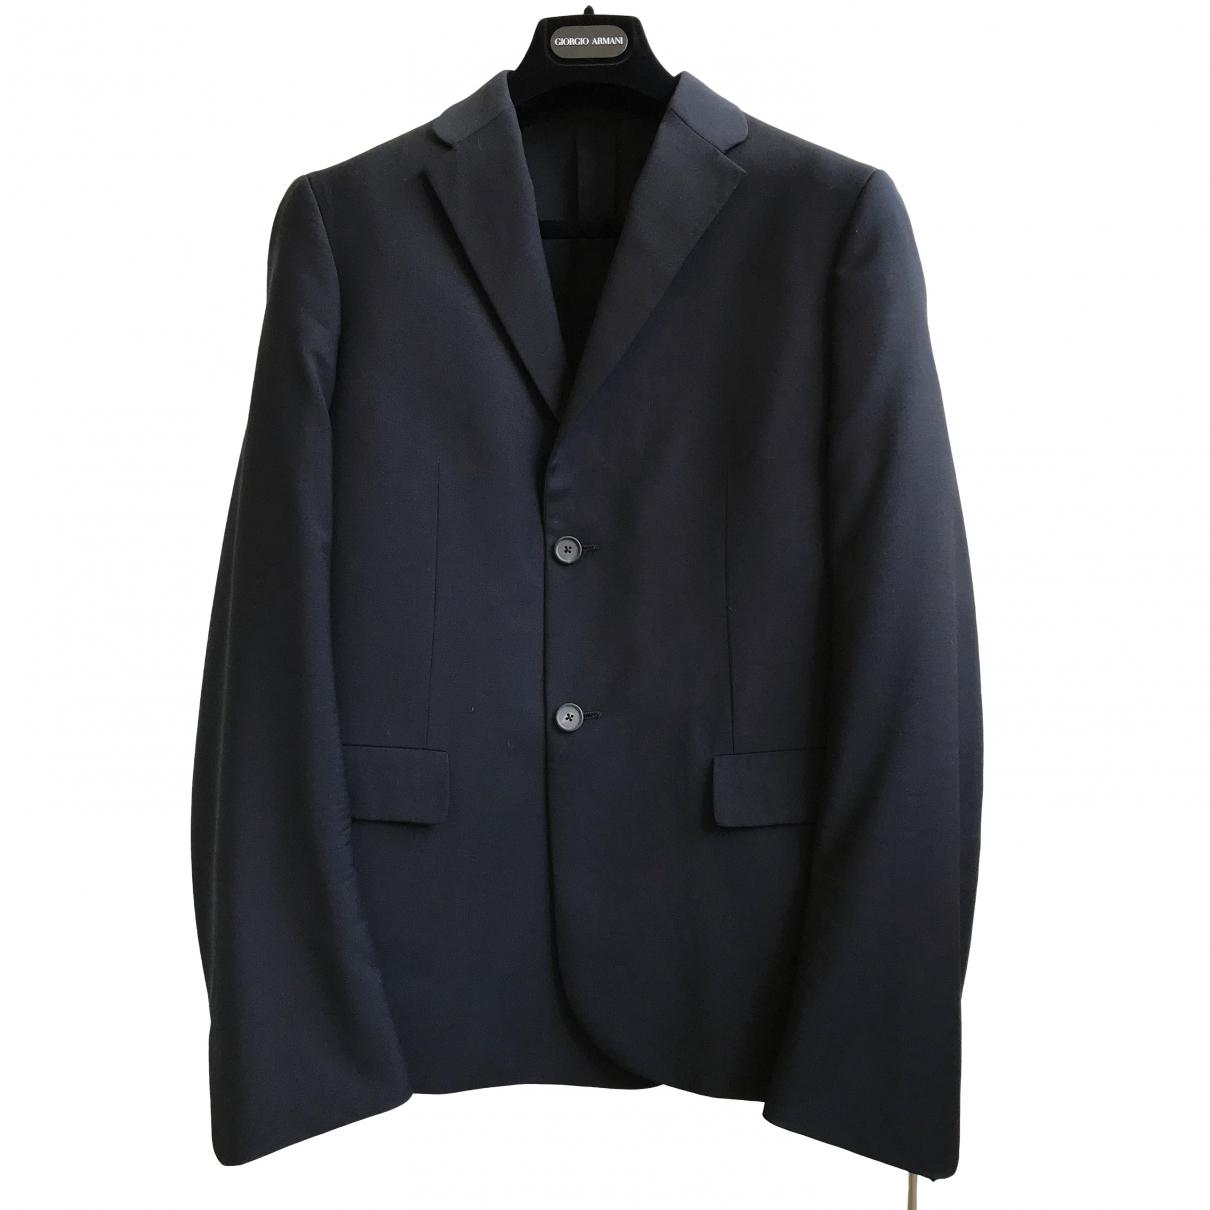 Jil Sander \N Navy Wool jacket  for Men 48 IT